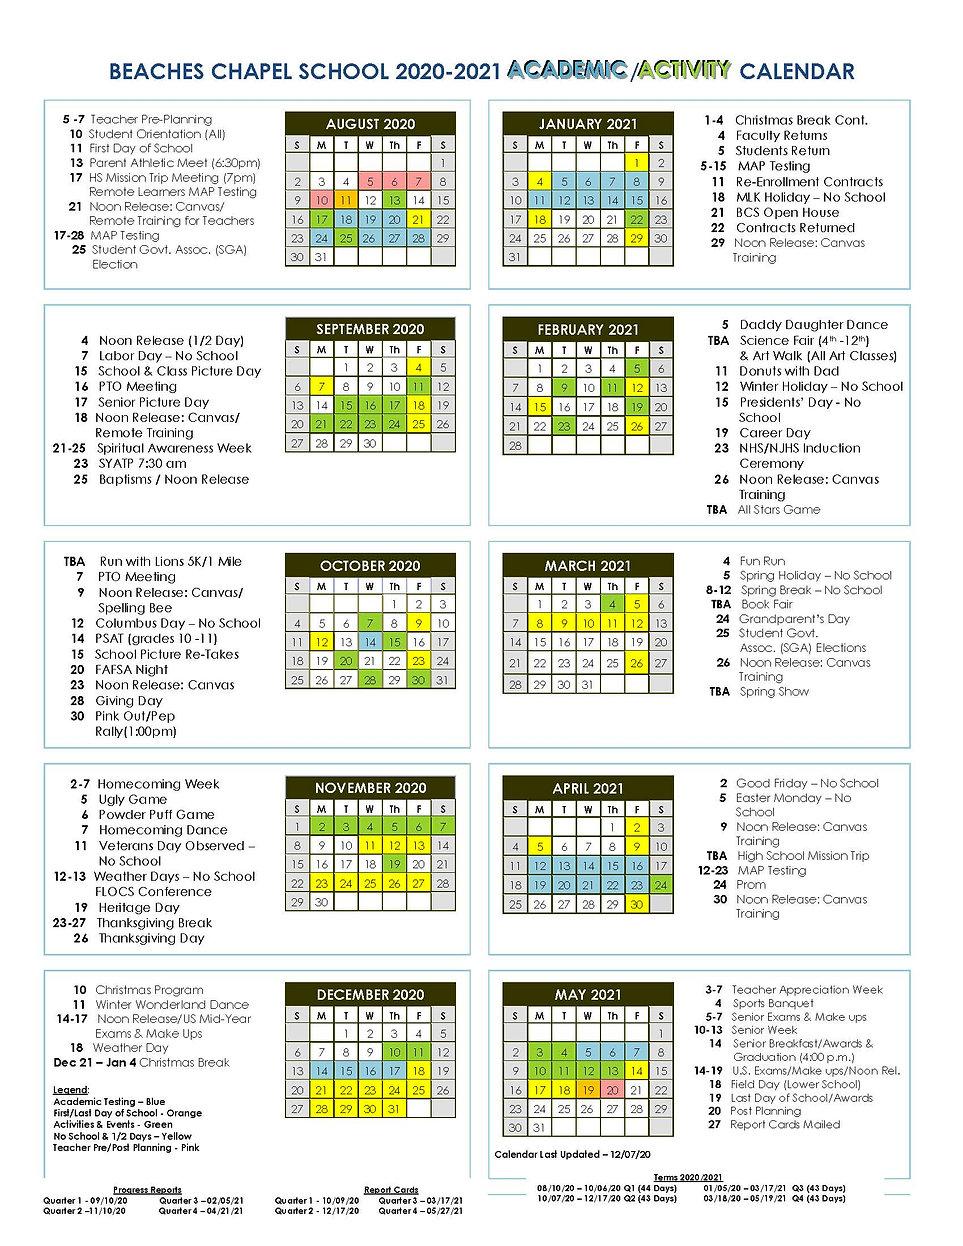 BCS 2020-21 12.07 updated Academic Activ